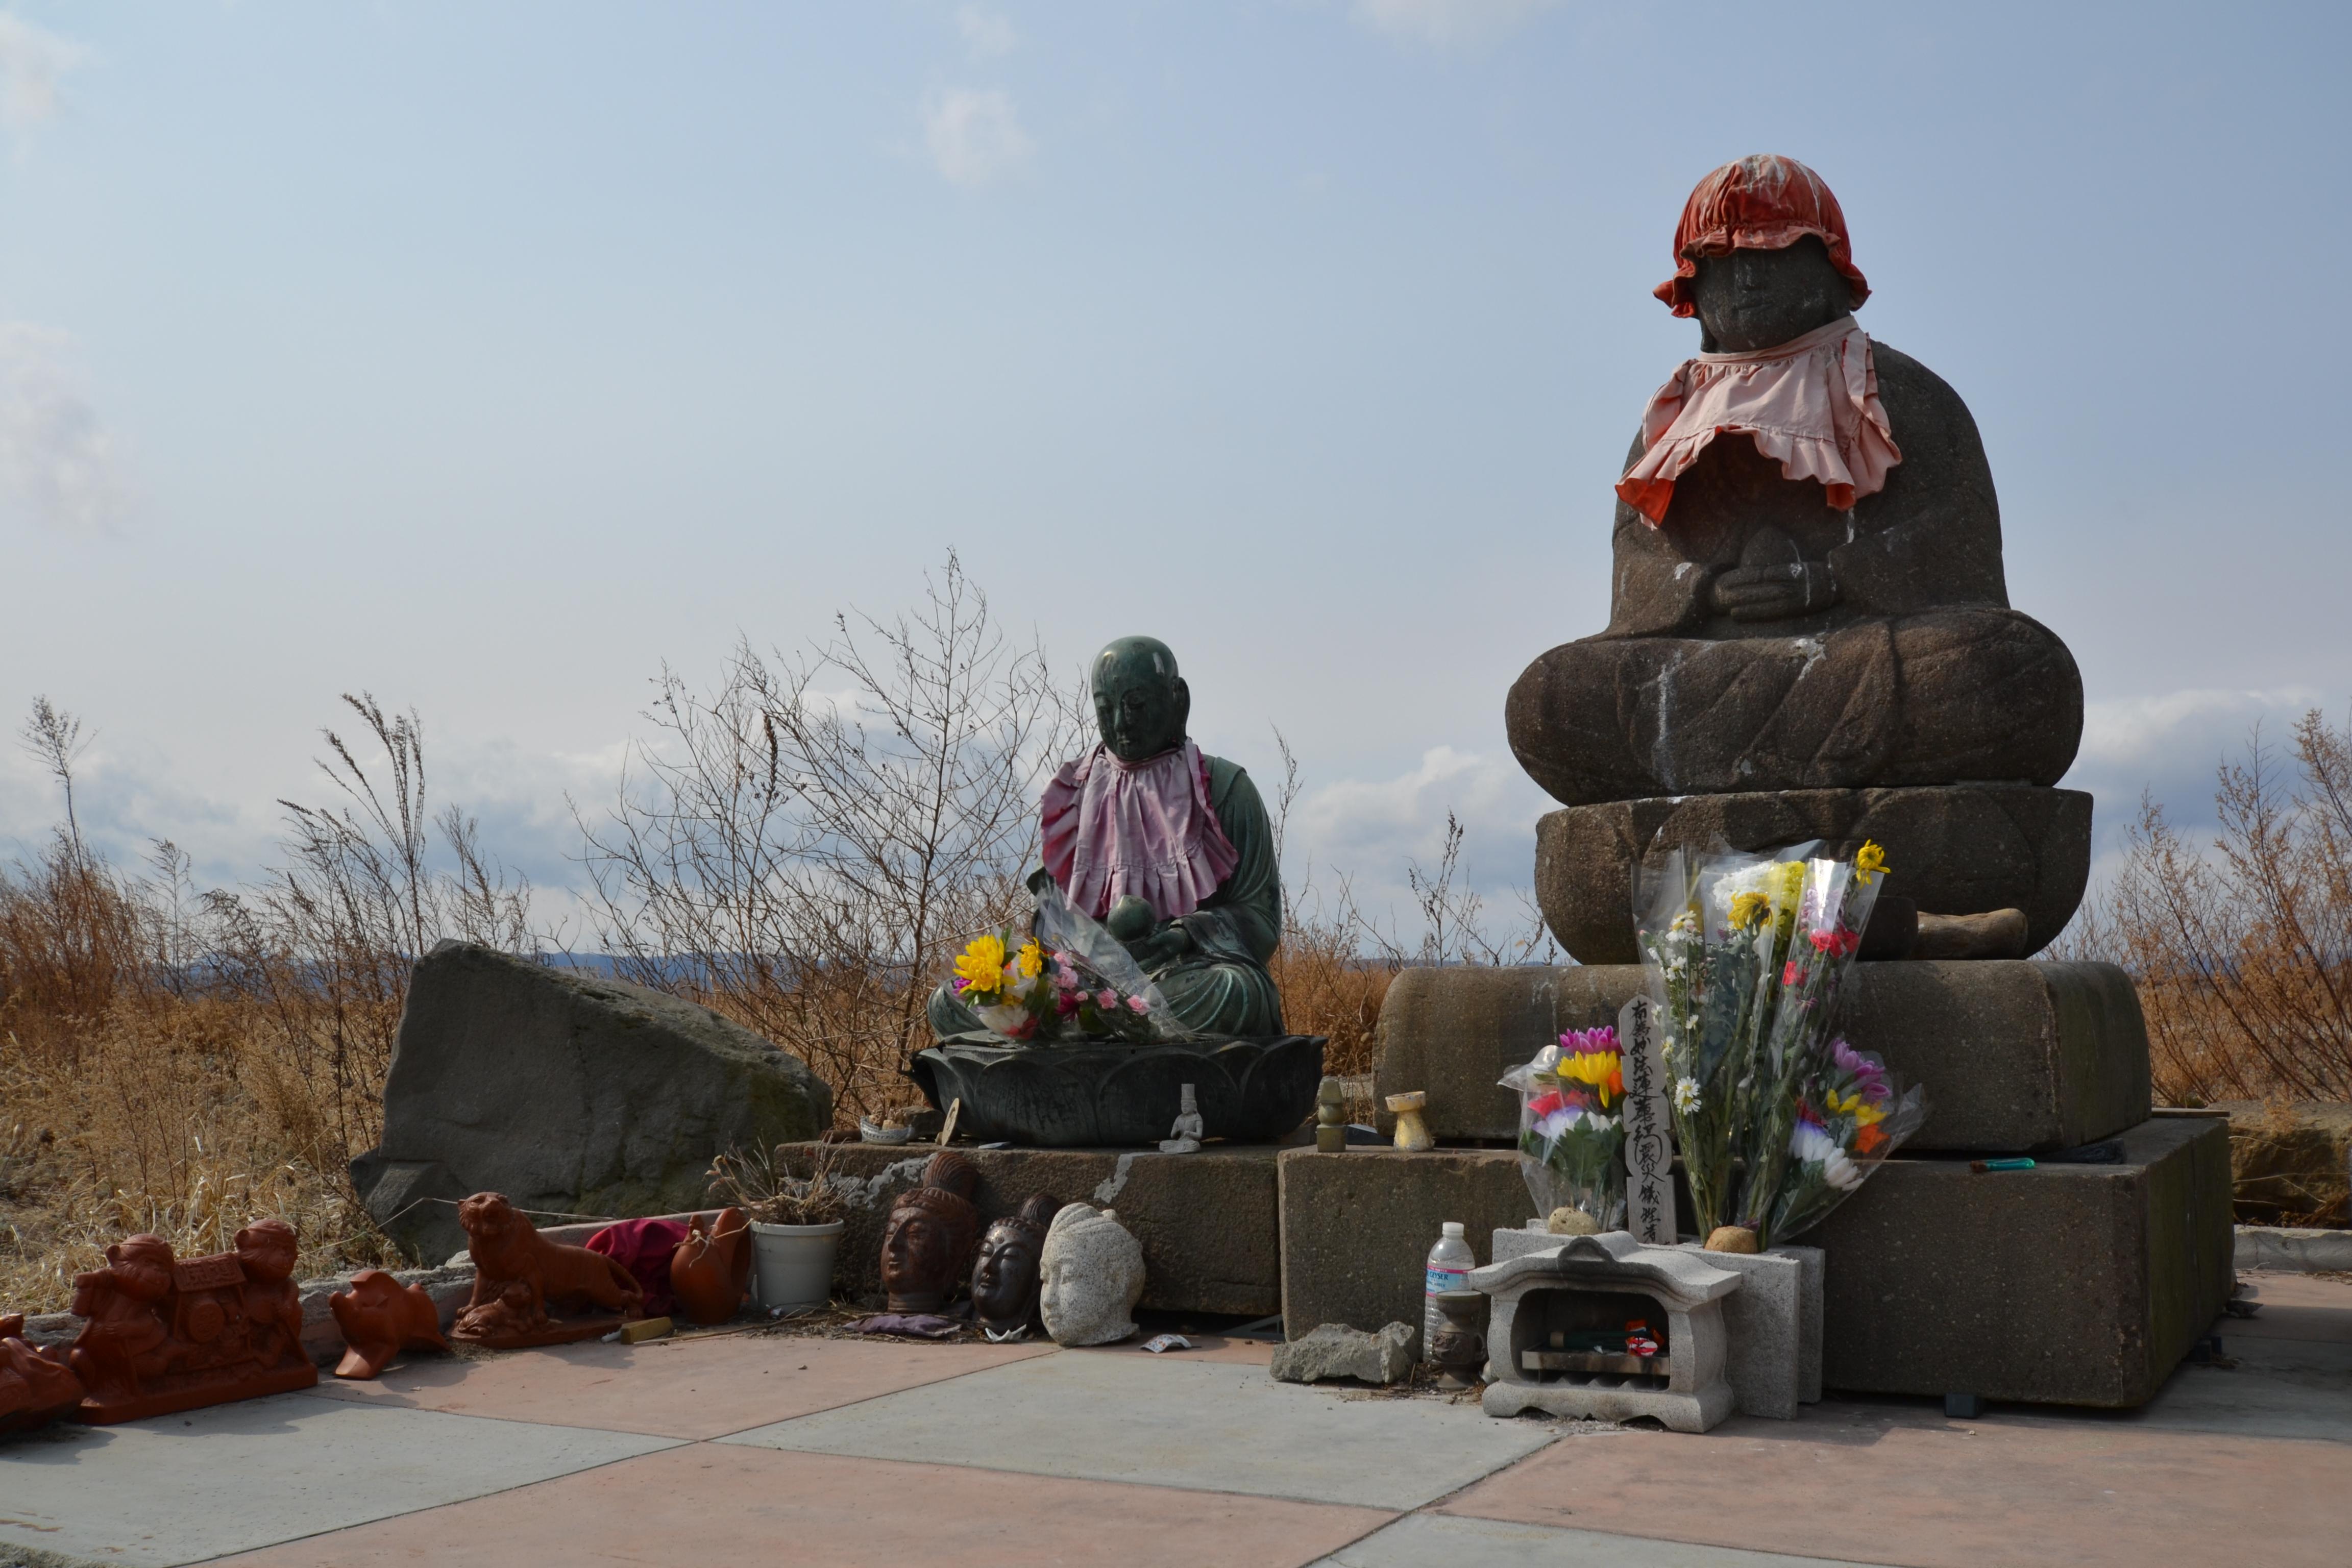 yuriage gone 2 statues for flowers prayers.JPG